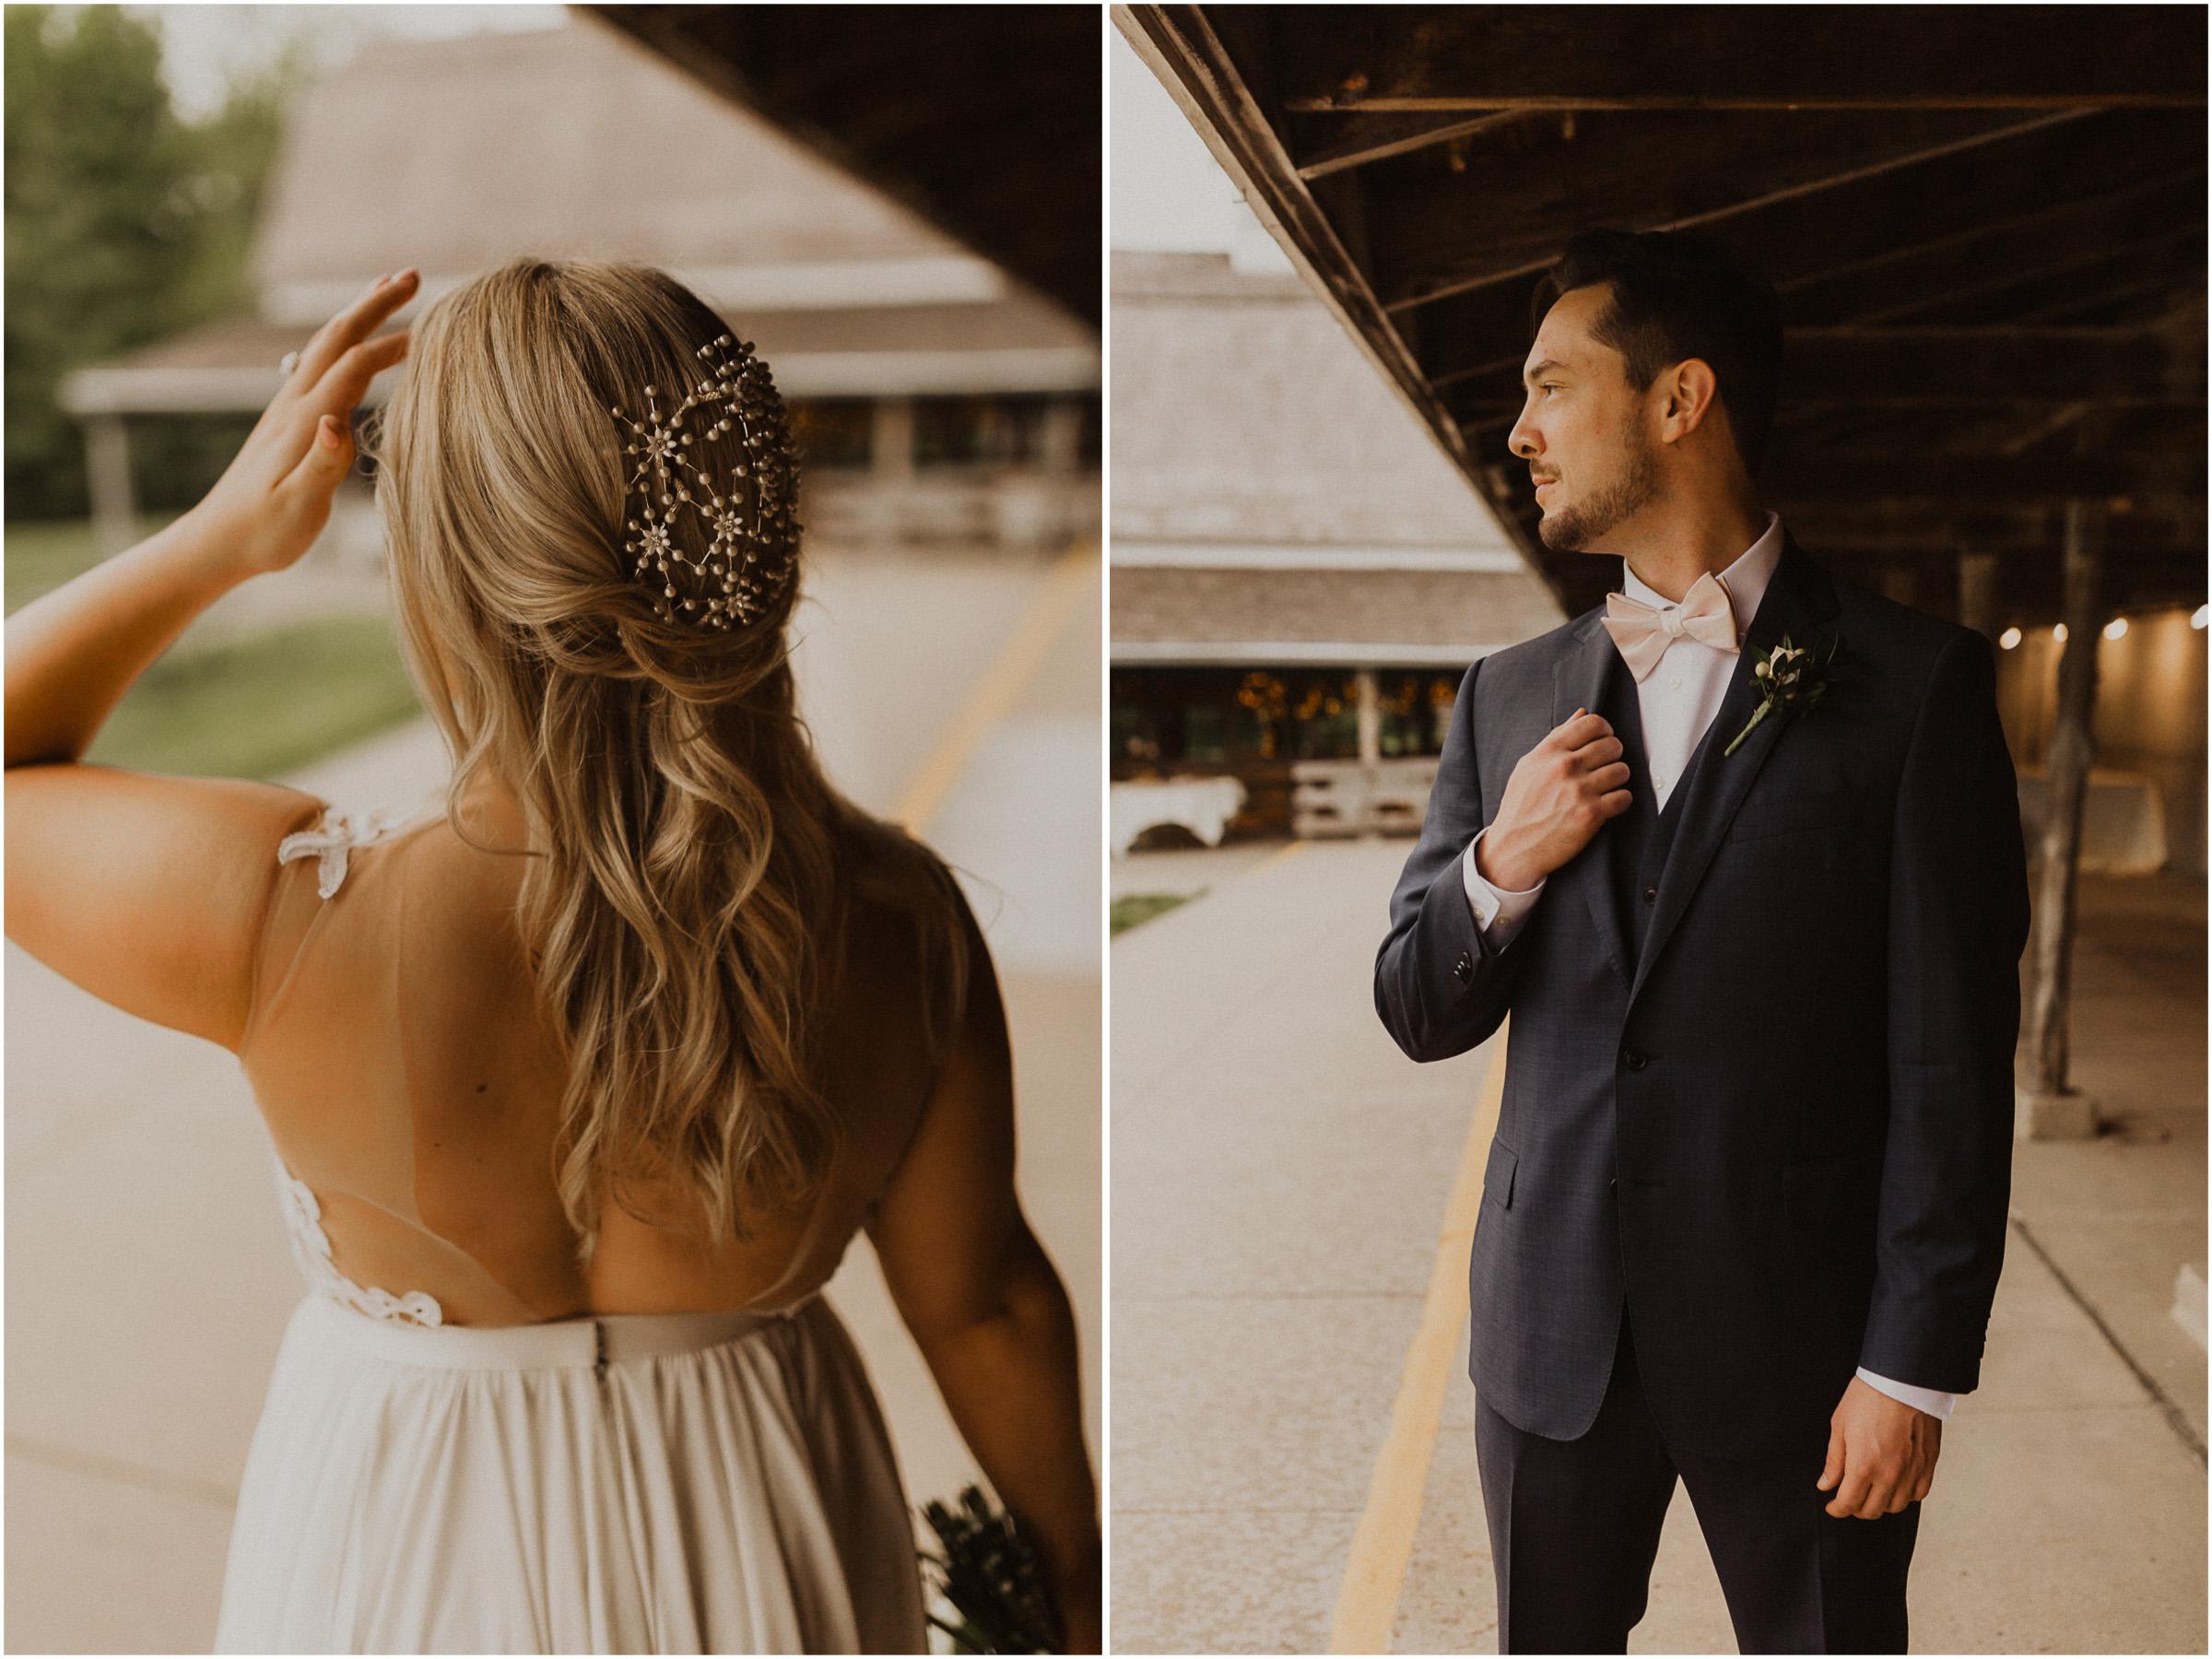 alyssa barletter photography nelson wedding nebraska city lied lodge morton barn spring wedding photographer-28.jpg